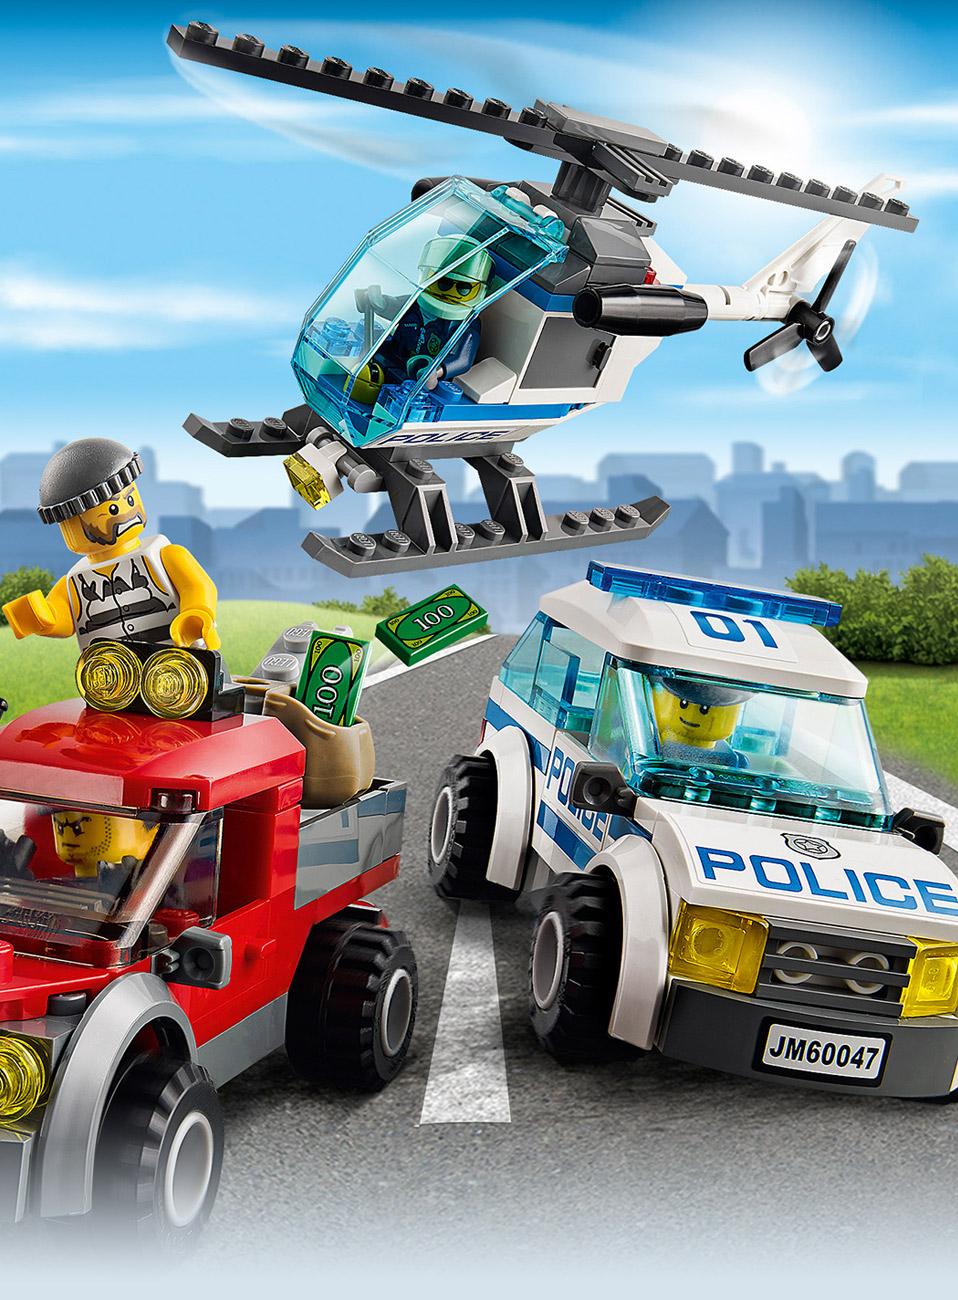 Lego city lego lek gadgets for Mobilia webhallen